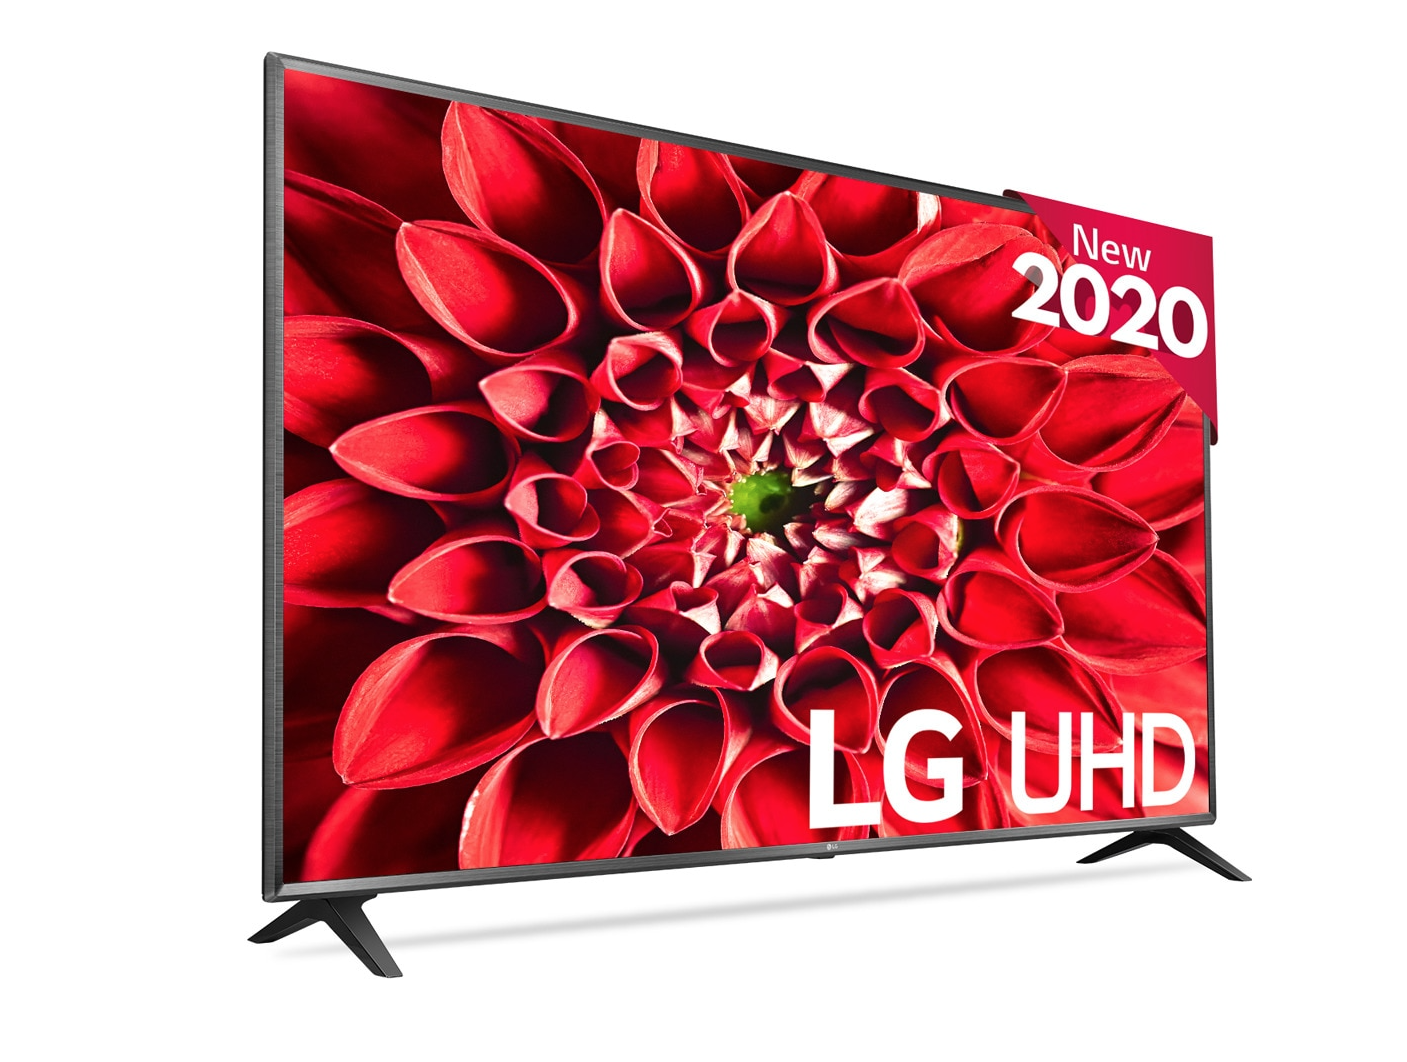 "TV LED 189,4 cm (75"") LG 75UN71006LC 4K con Inteligencia Artificial, HDR 10 Pro y Smart TV"